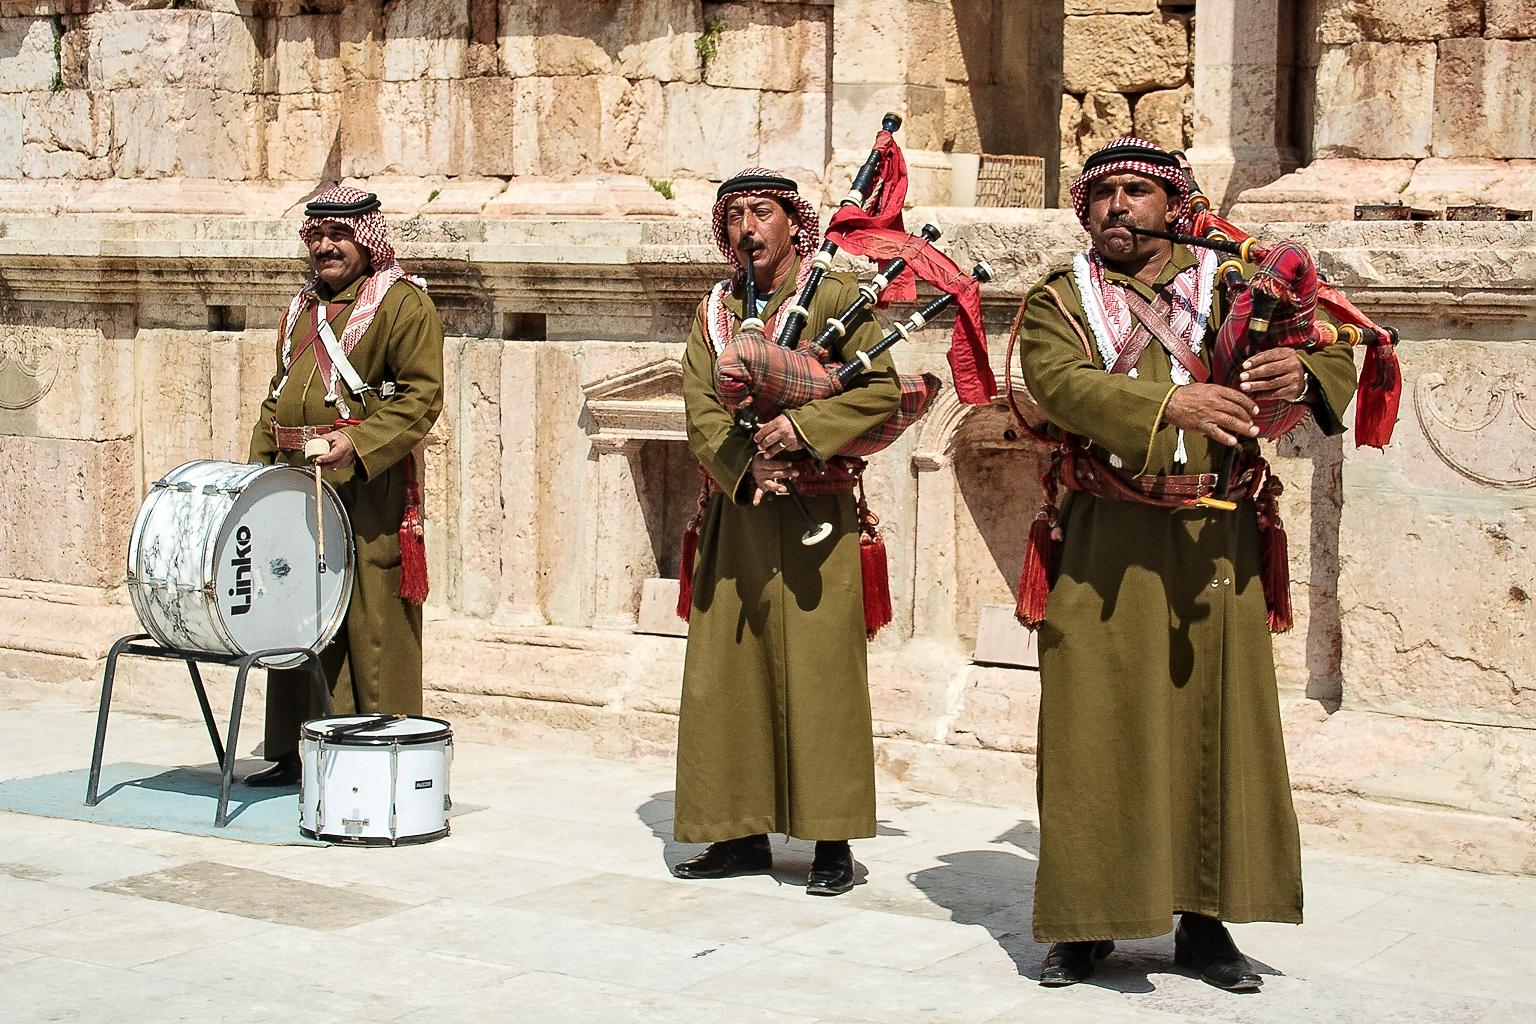 Bagpipers at the South Theater, Jerash, Jordan